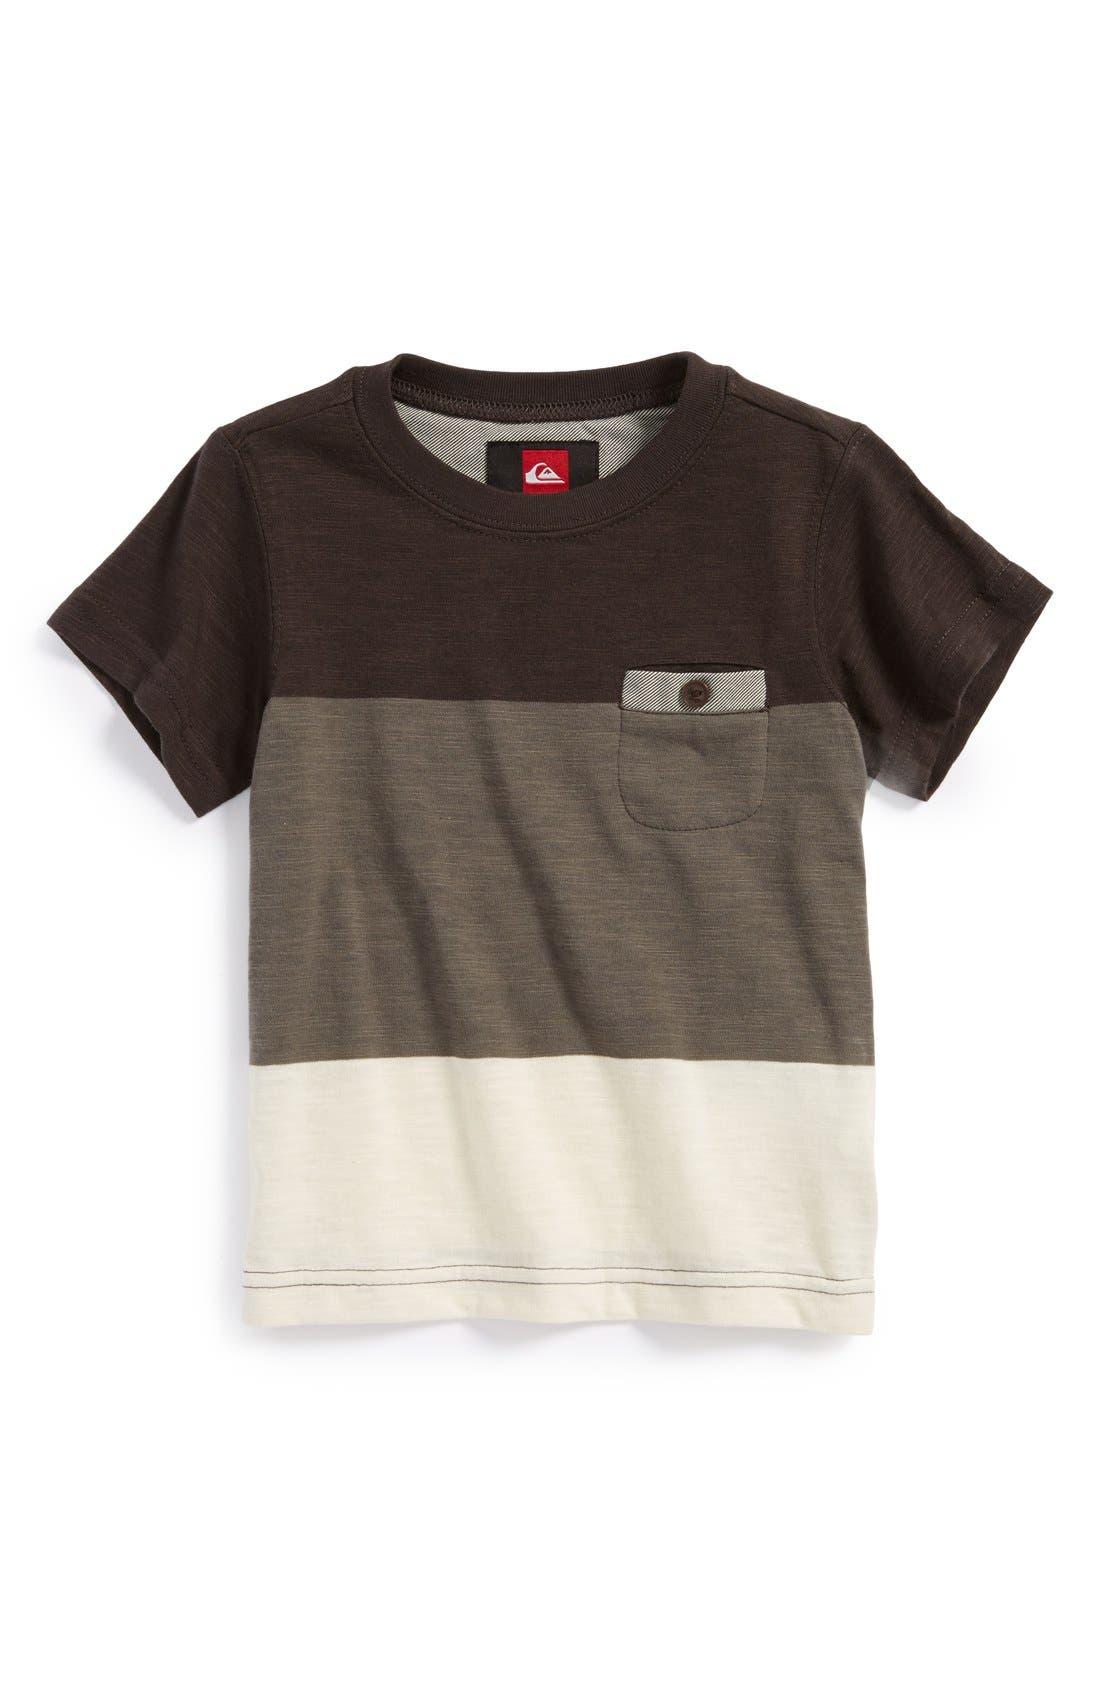 Main Image - Quiksilver 'Half Pint' Slub T-Shirt (Toddler Boys)